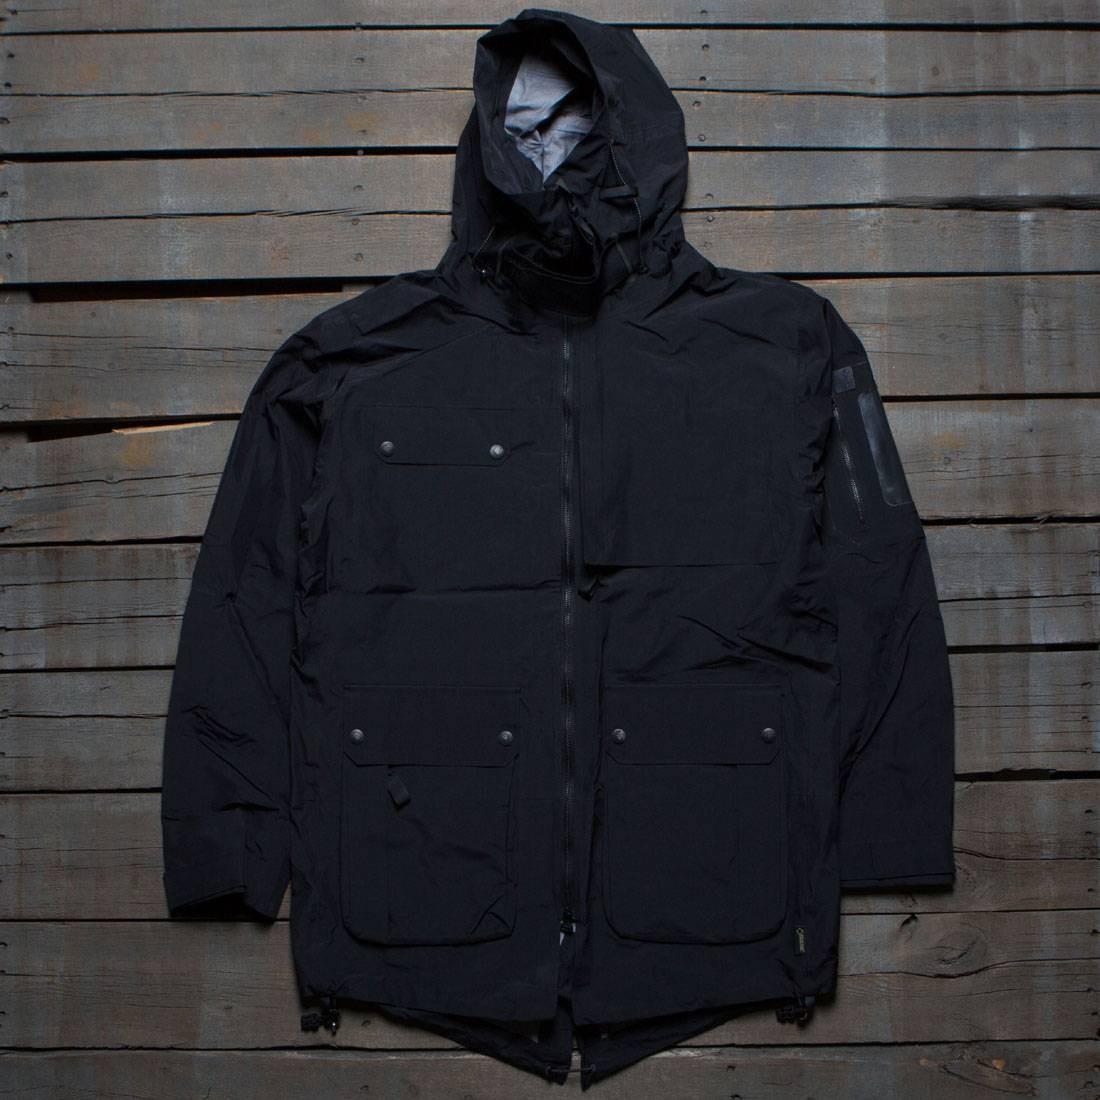 c72b9bb16696 Adidas Consortium Day One Men Gore-Tex Parka black